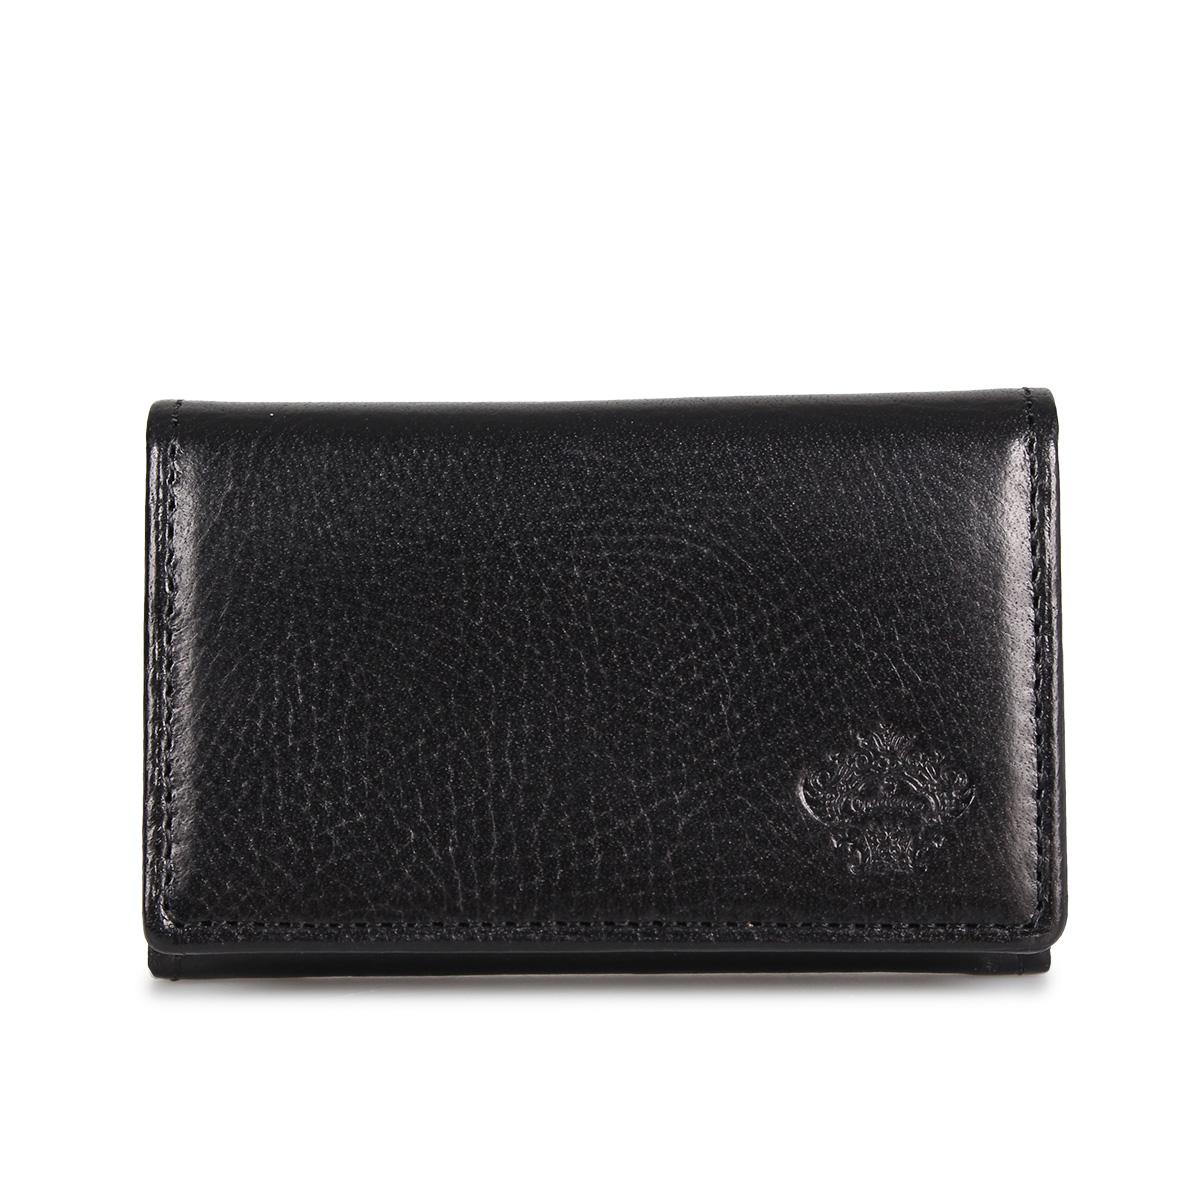 Orobianco COIN CASE オロビアンコ 財布 小銭入れ コインケース メンズ 本革 ブラック 黒 ORS 0306mn8N0w